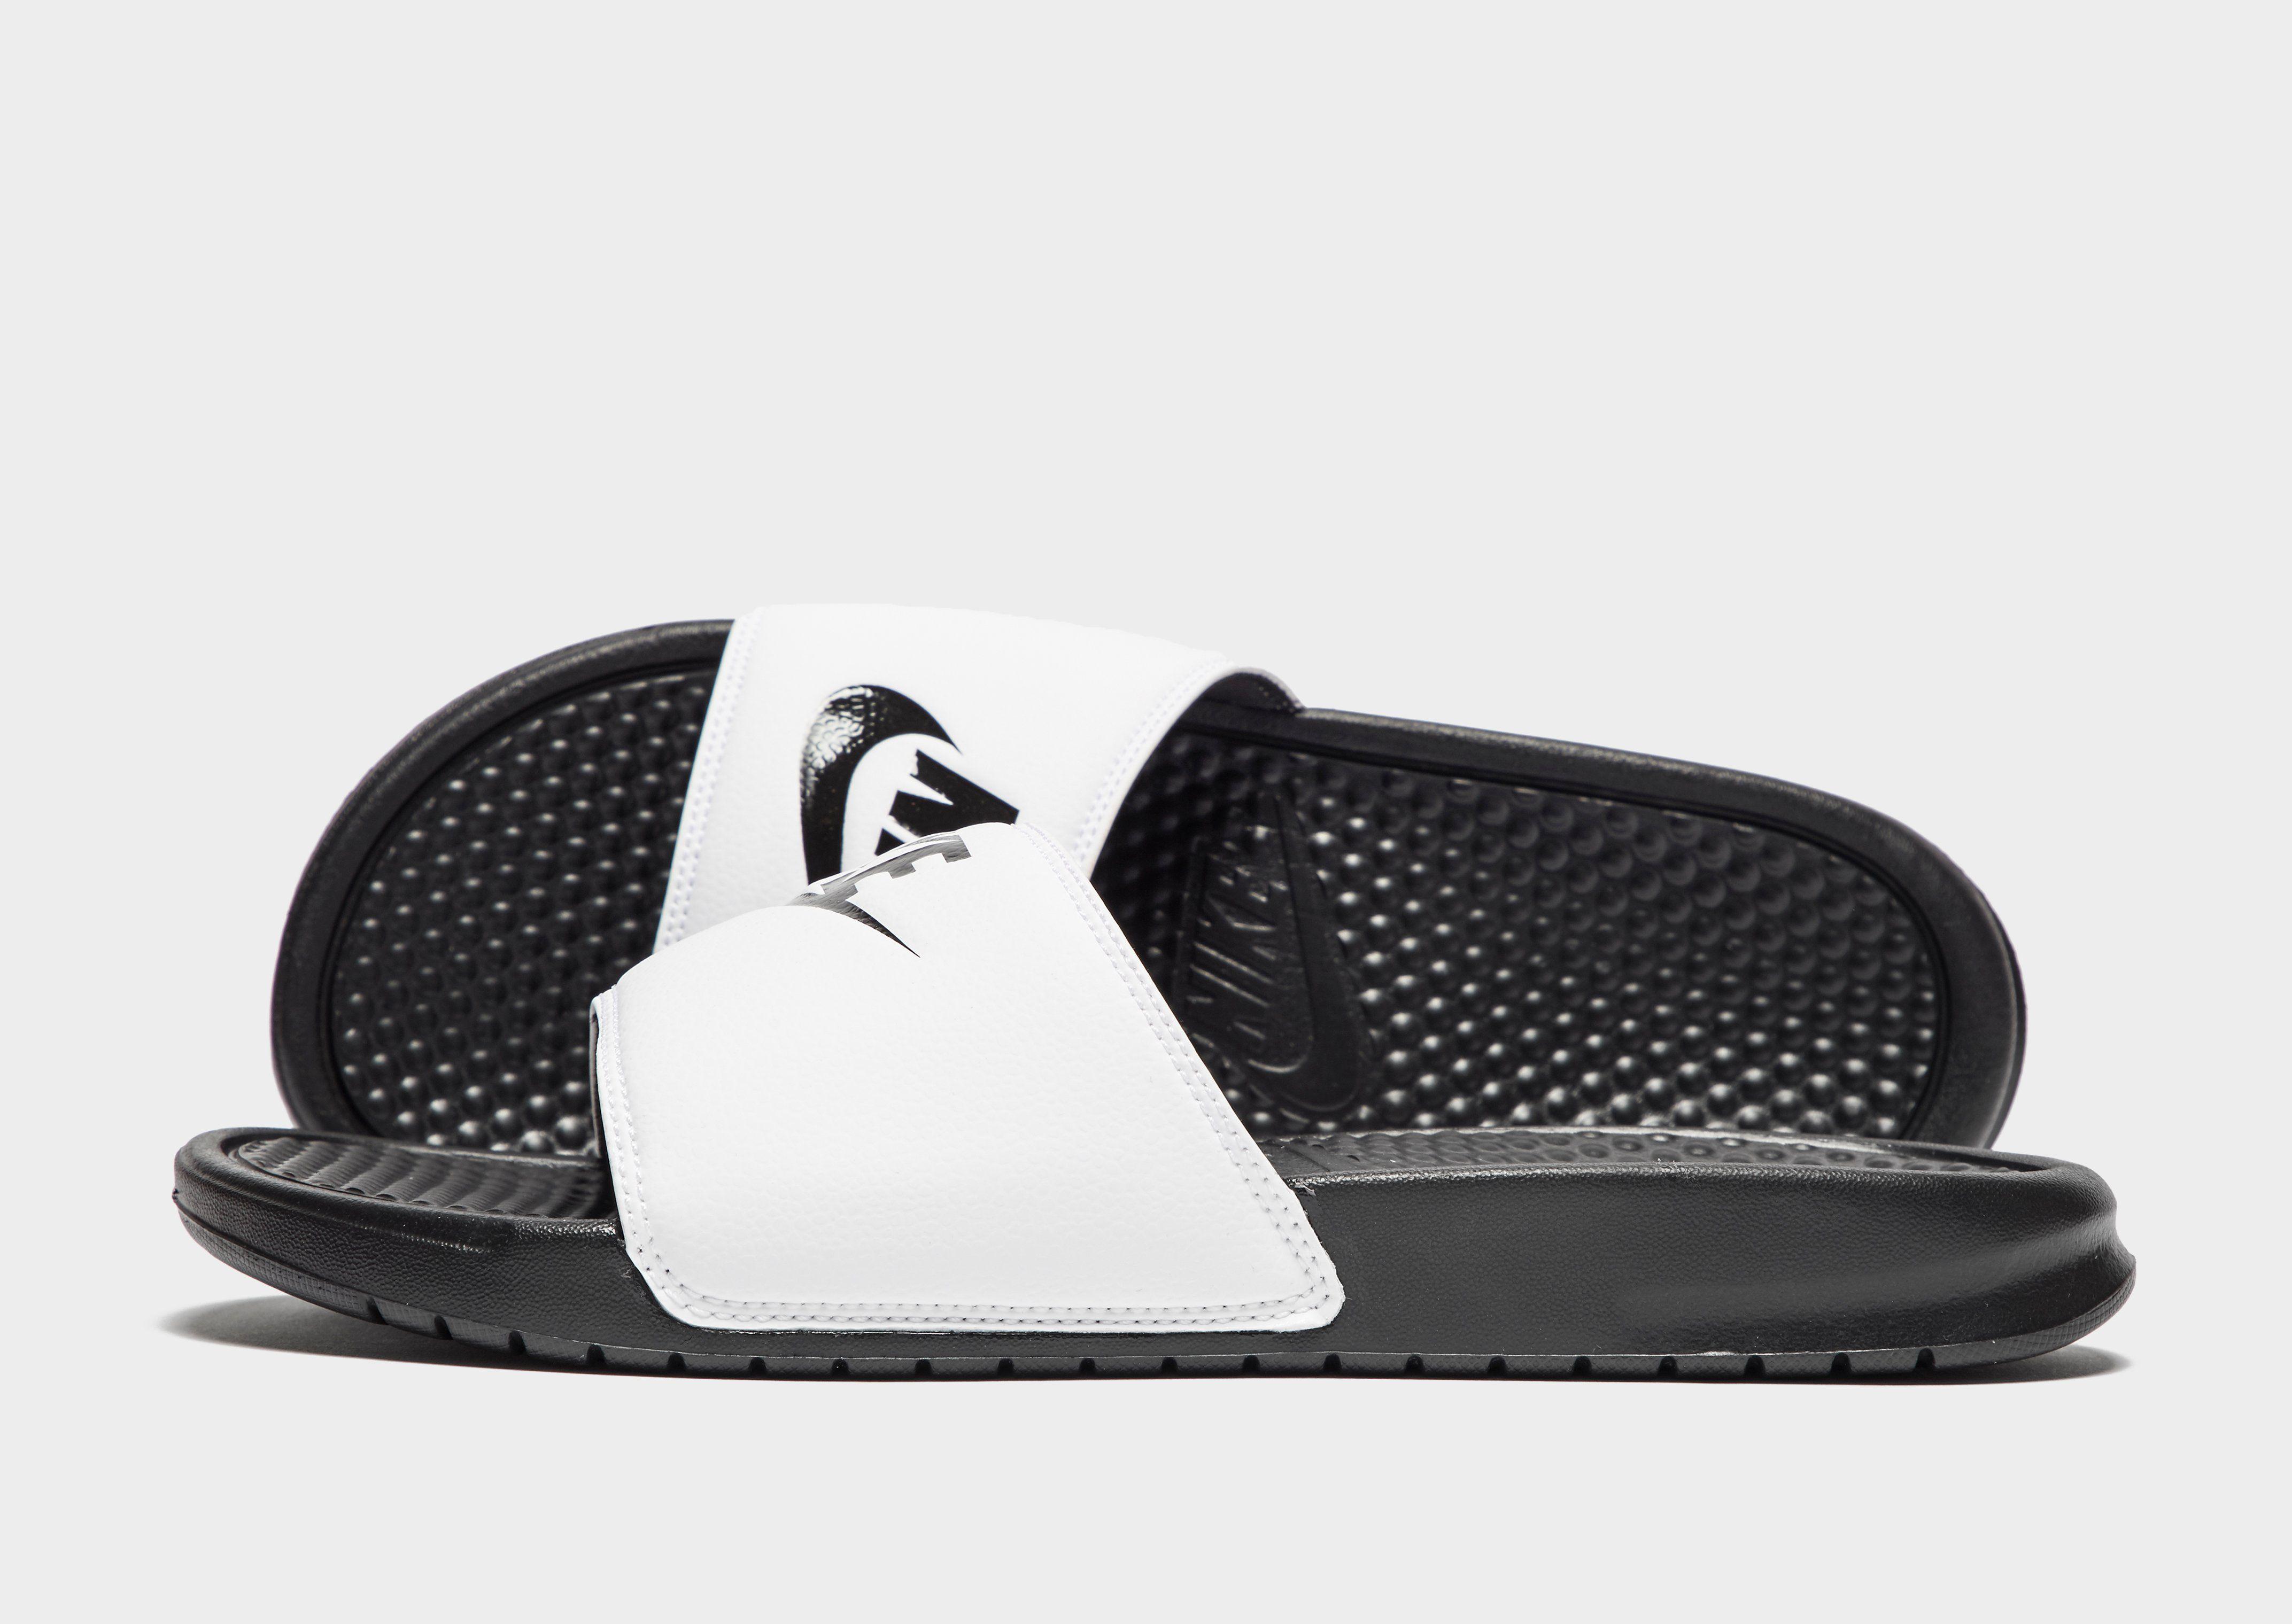 88dcab54fe82 Nike Benassi Slides